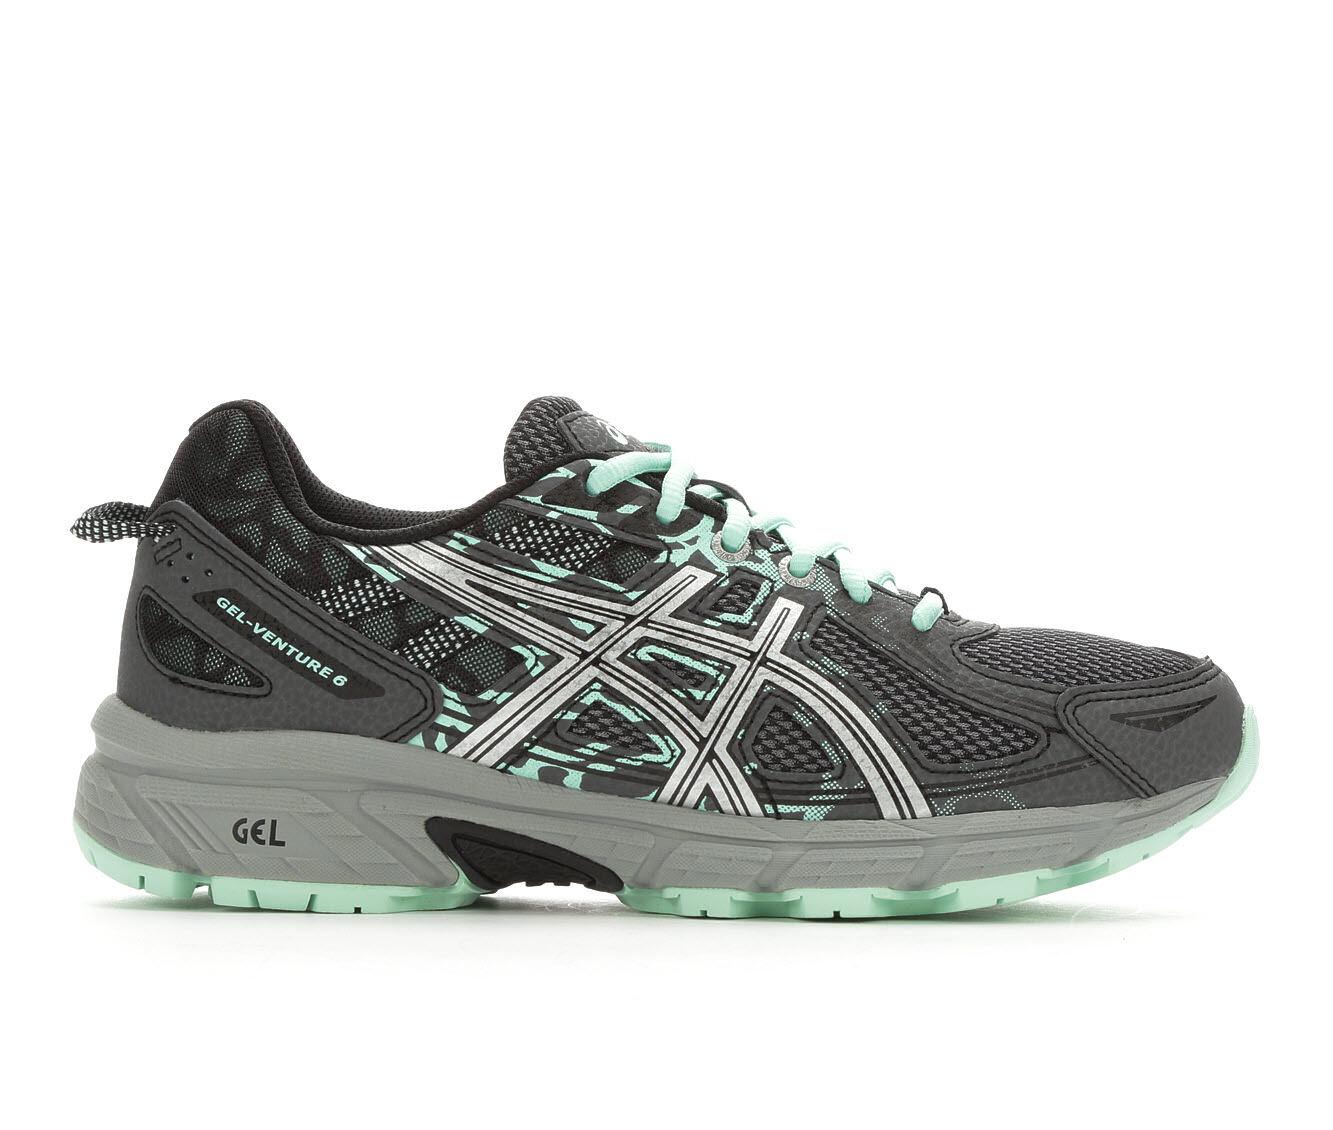 Women's ASICS Gel Venture 6 Trail Running Shoes Grey/Silv/Mint